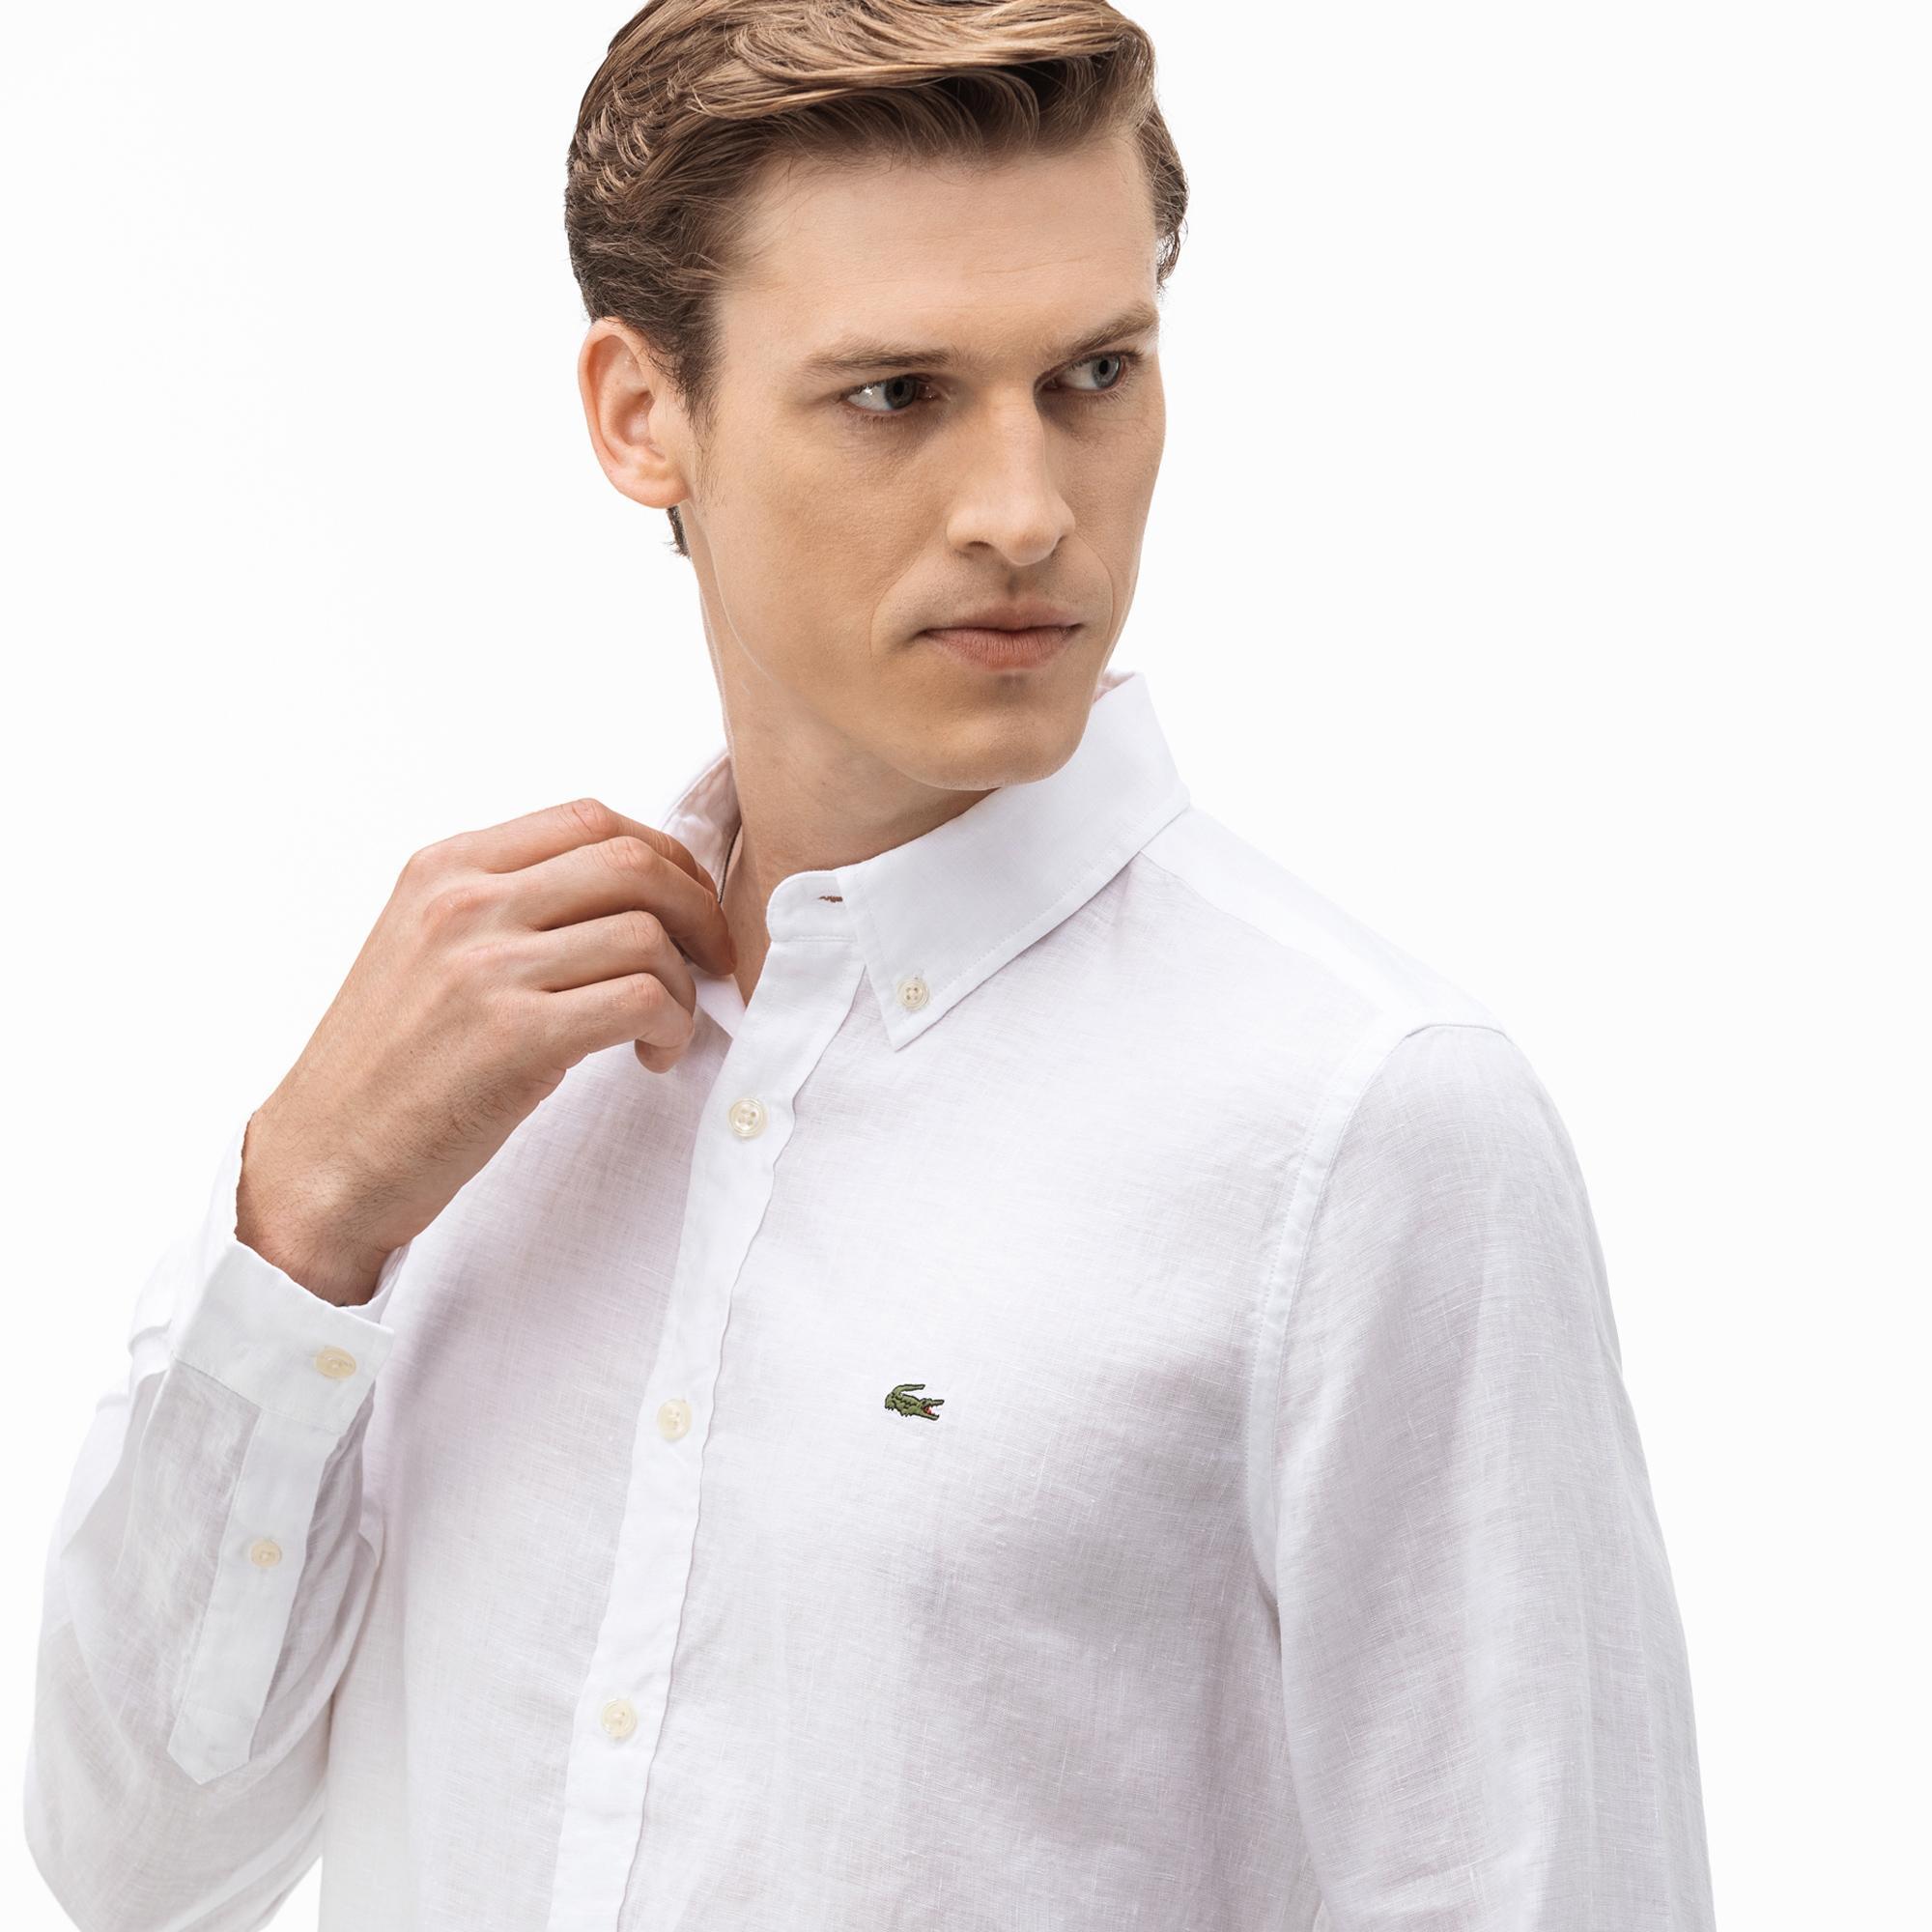 Lacoste Erkek Slim Fit Keten Beyaz Gömlek